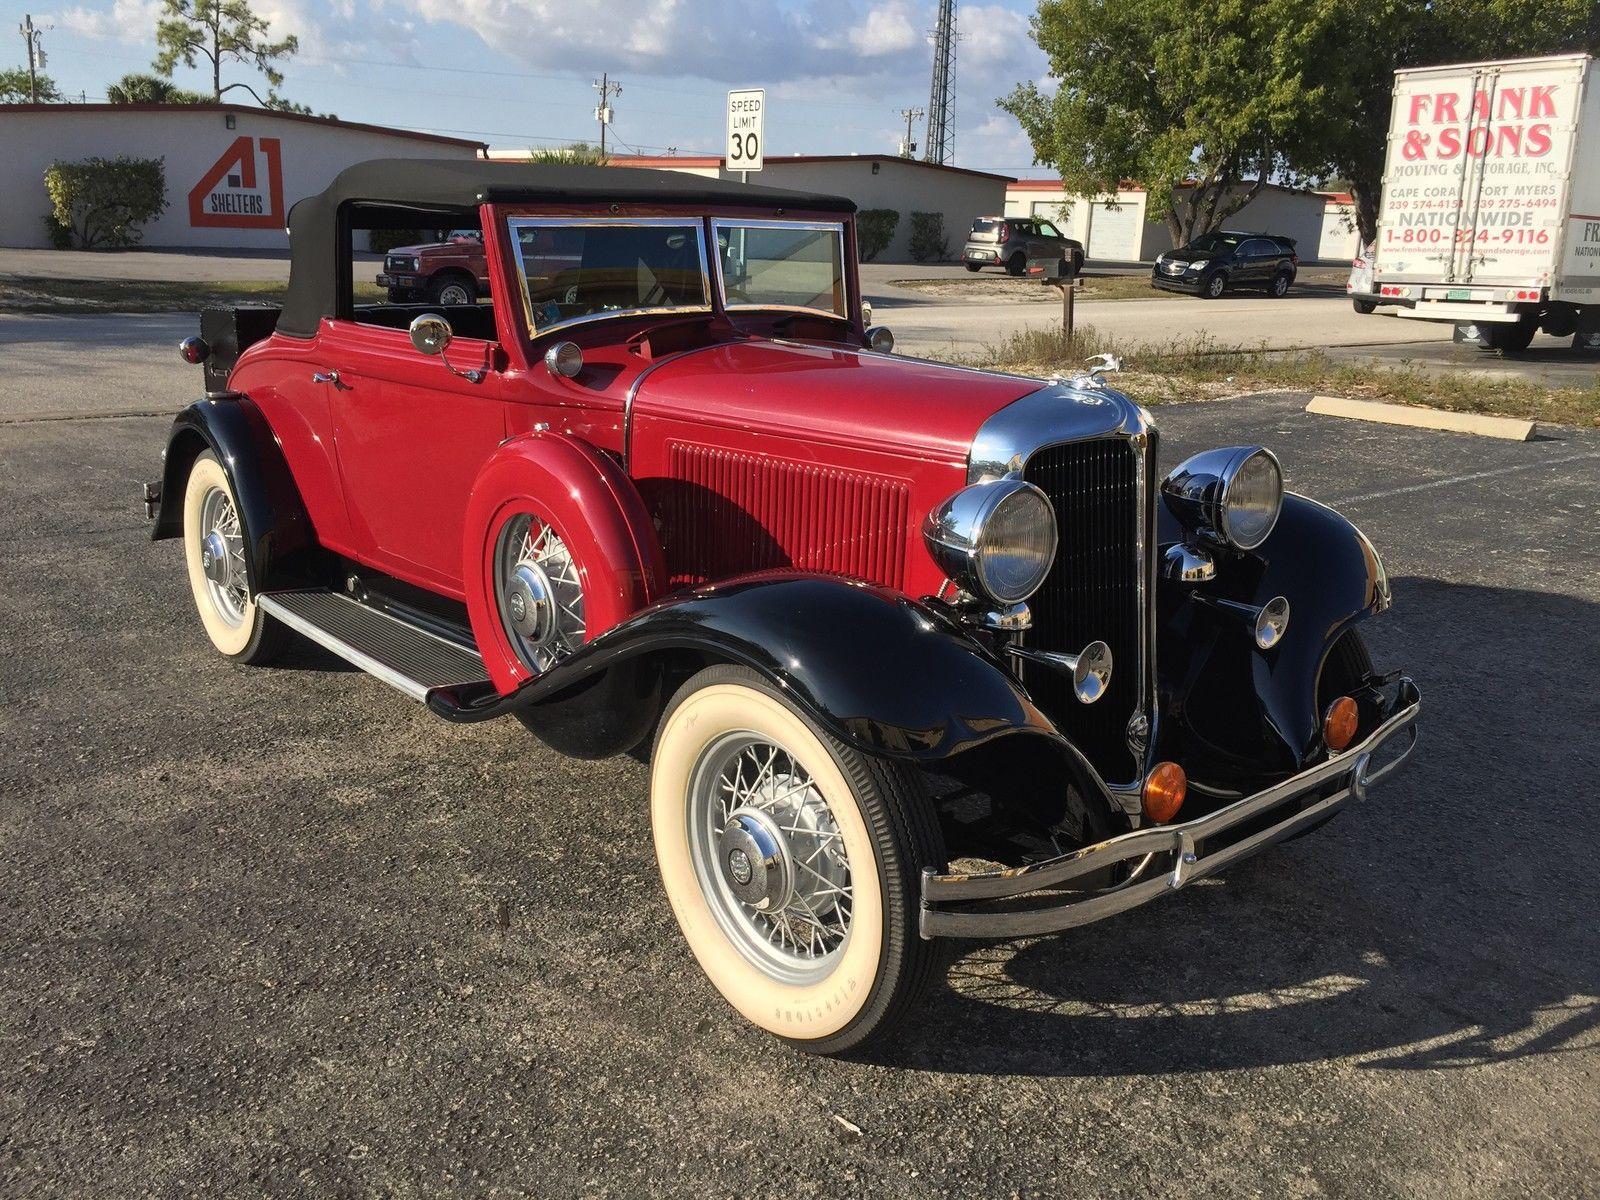 1932 Chrysler CI-6 Convertible | Convertible, Motor car and Cars